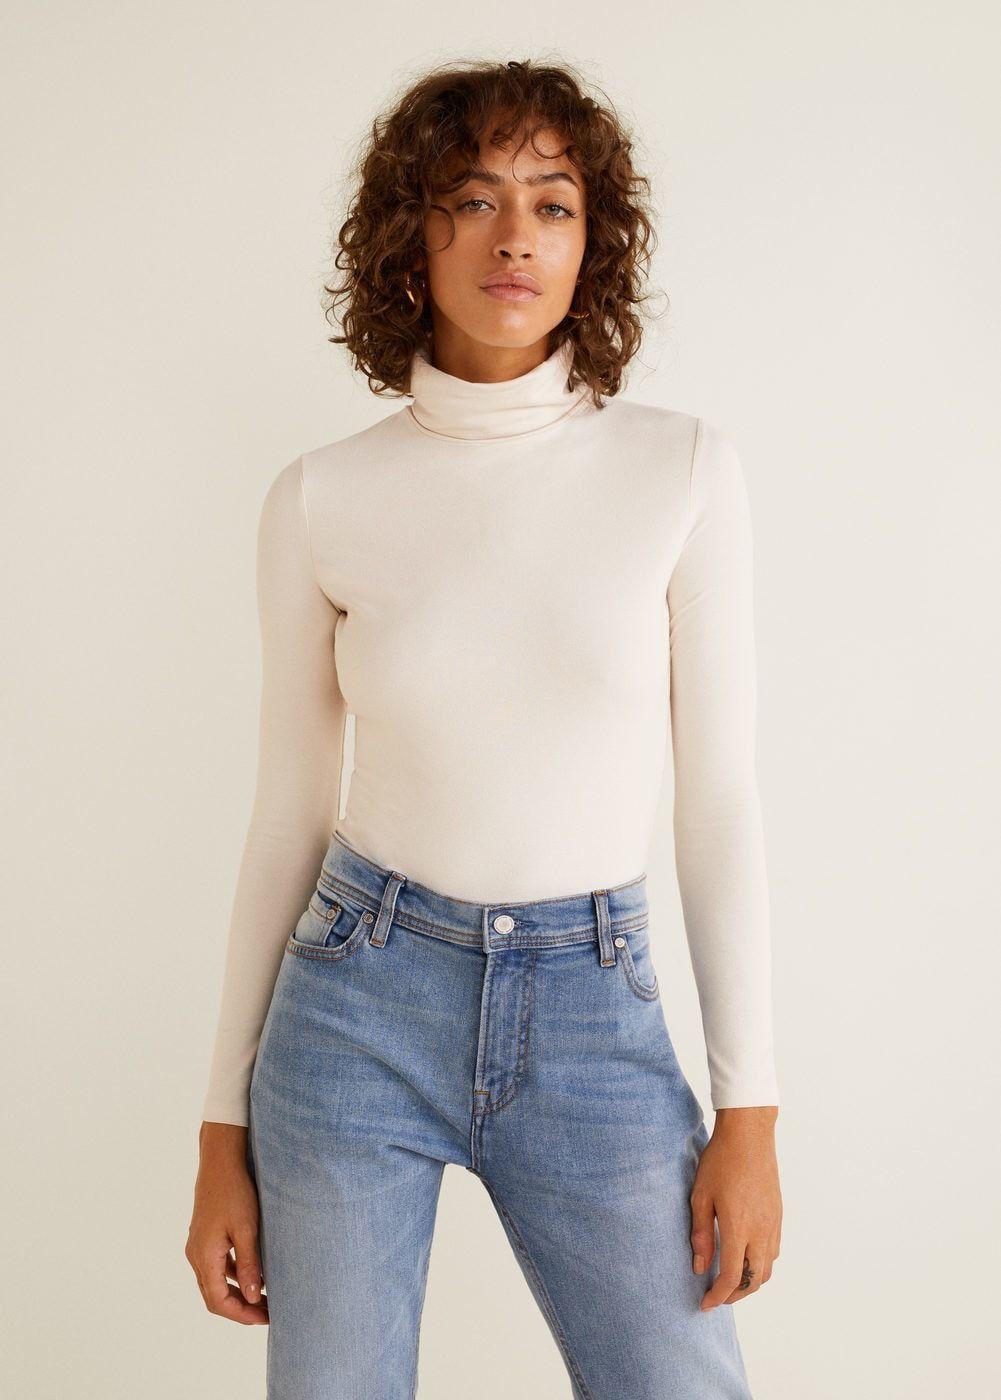 674e1158cfdaba Turtleneck body - Woman